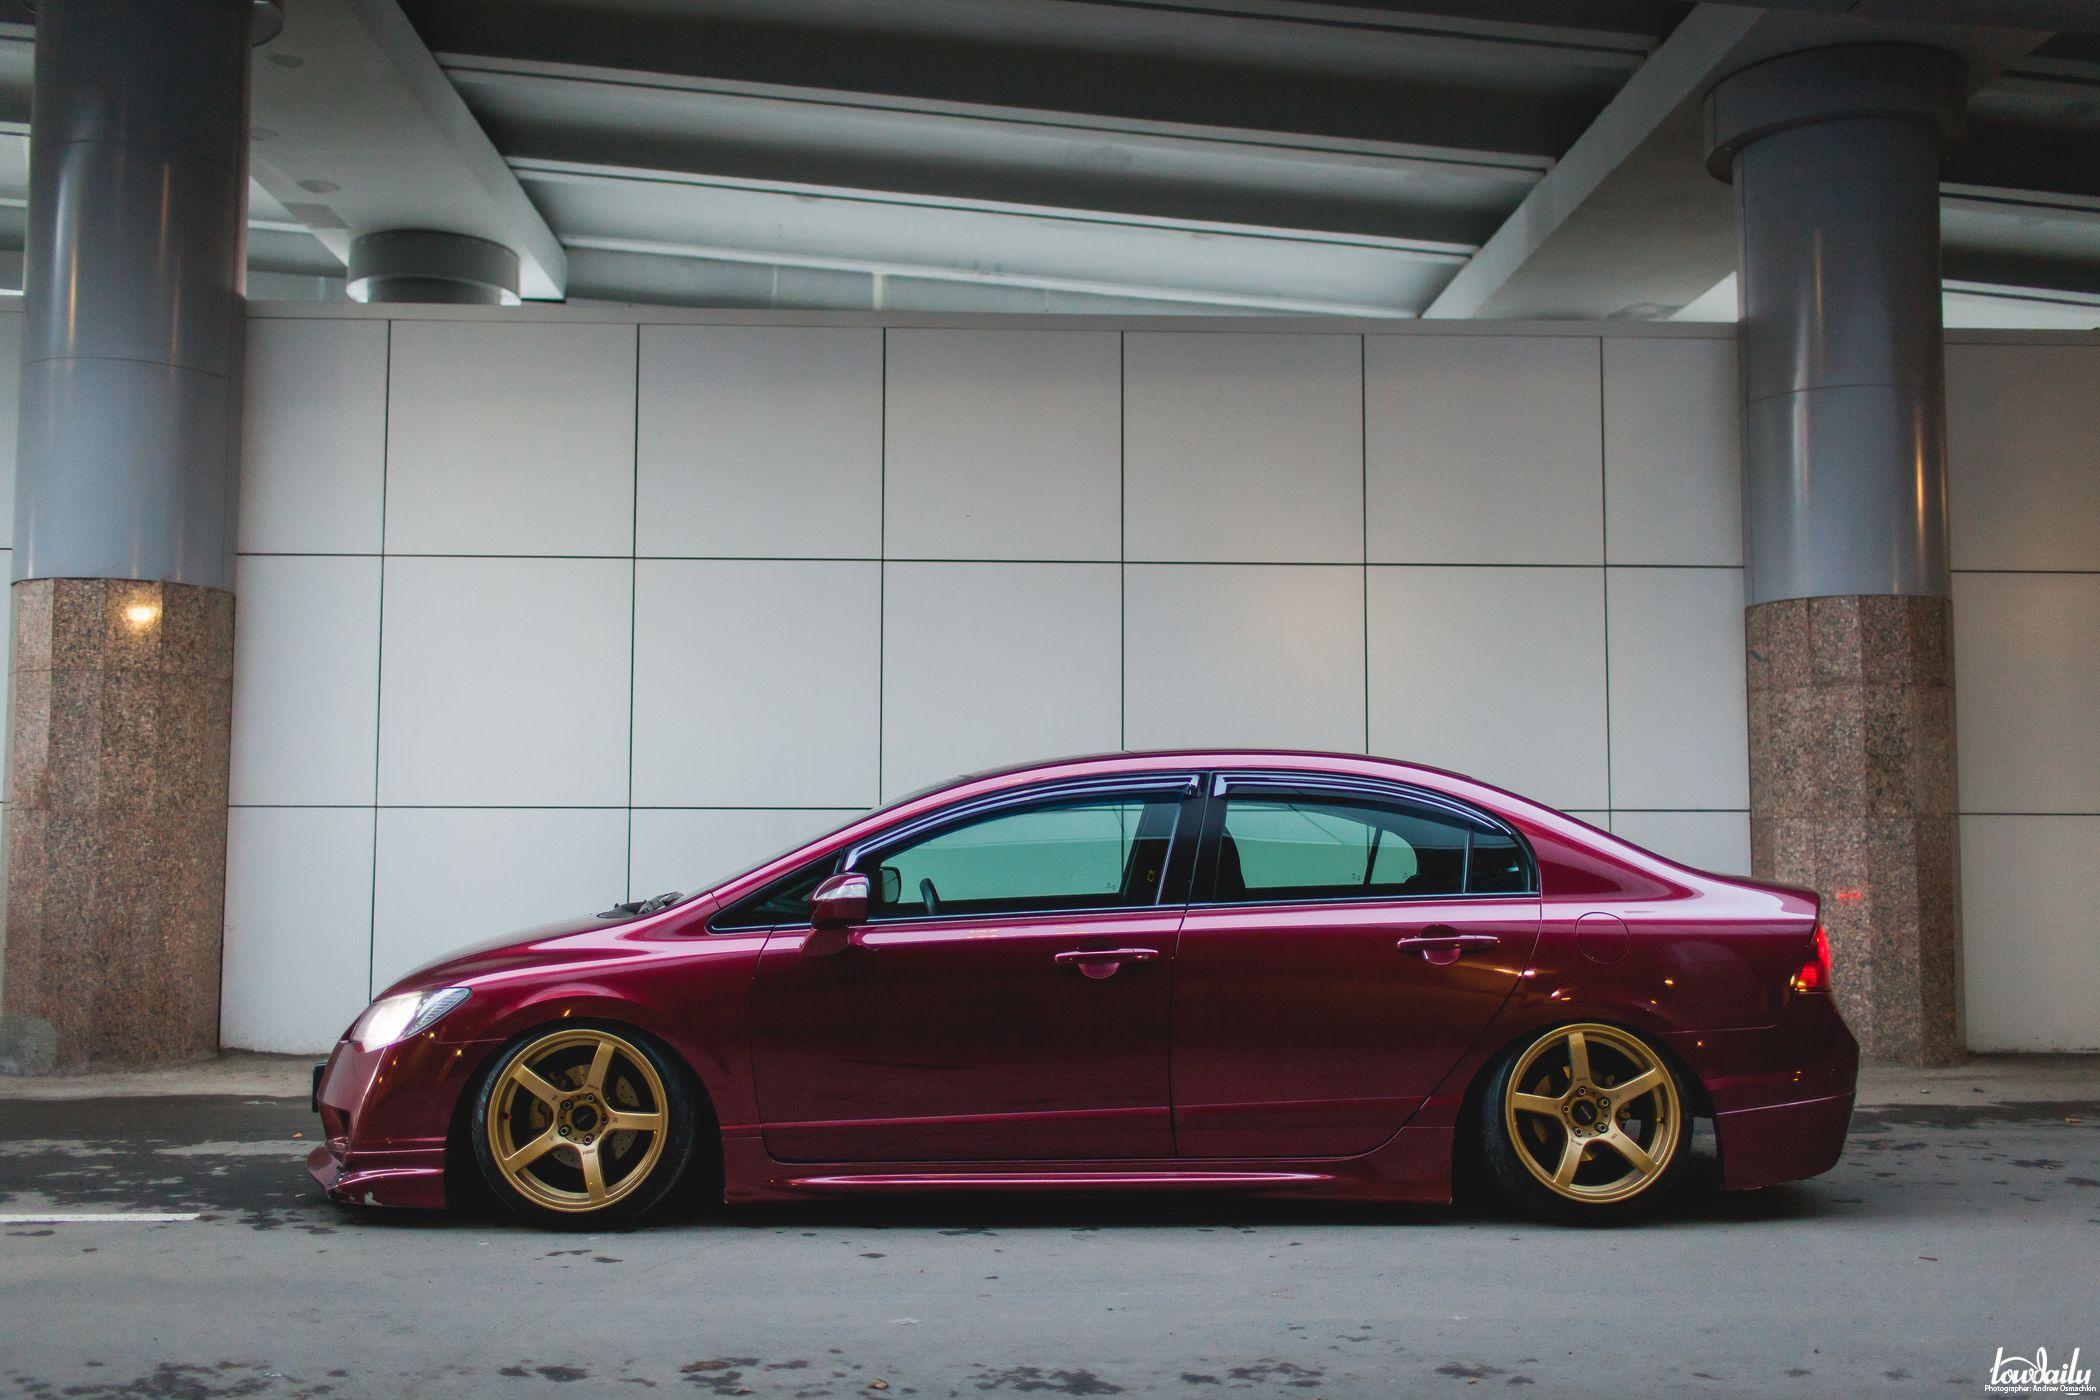 _Mg_5472_Honda_Civic